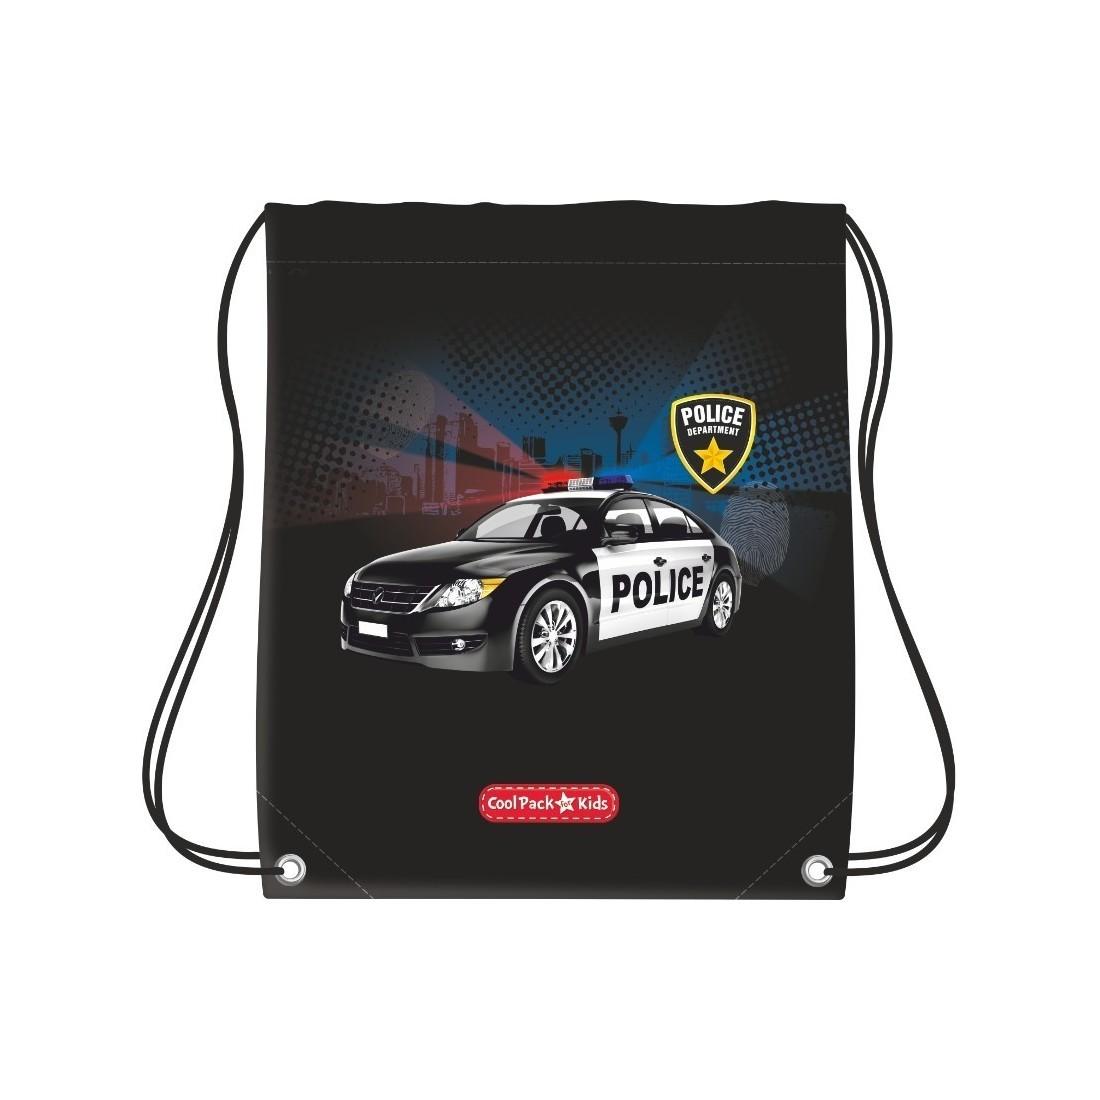 WOREK NA BUTY COOLPACK CP POLICE CZARNY Z RADIOWOZEM - plecak-tornister.pl